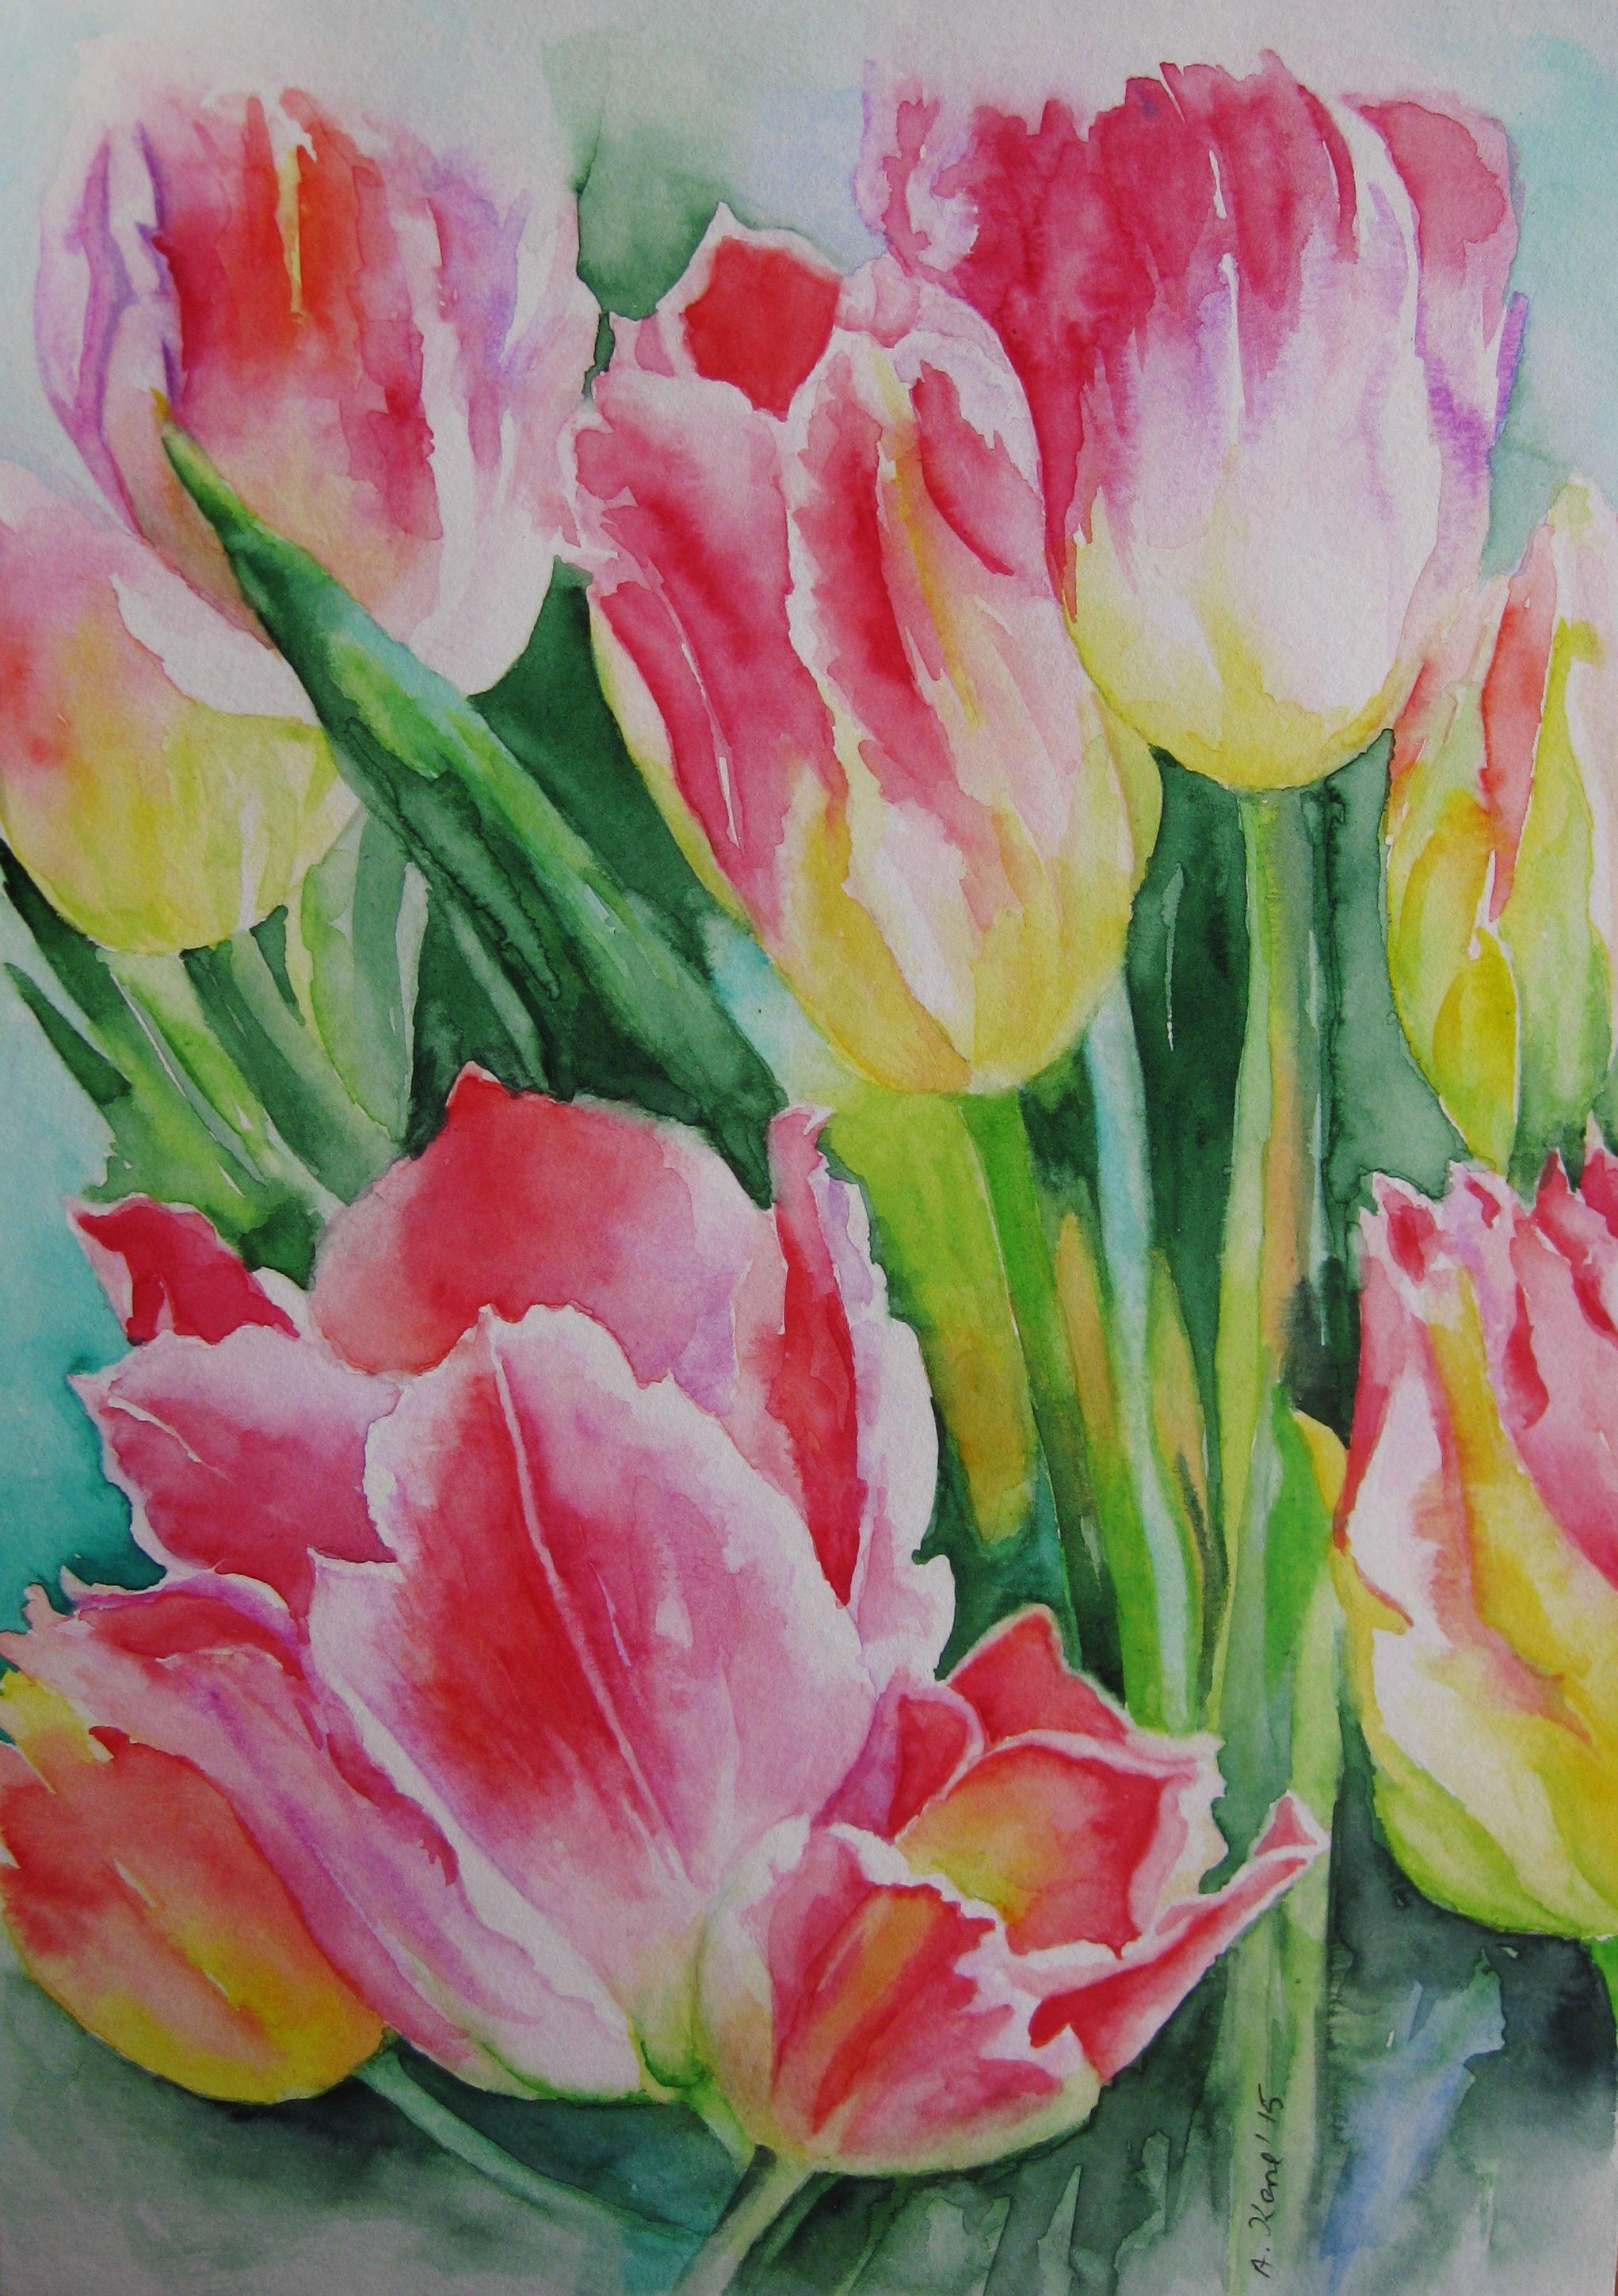 Img 4155 In 2020 Blumen Malen Aquarell Blumen Und Aquarell